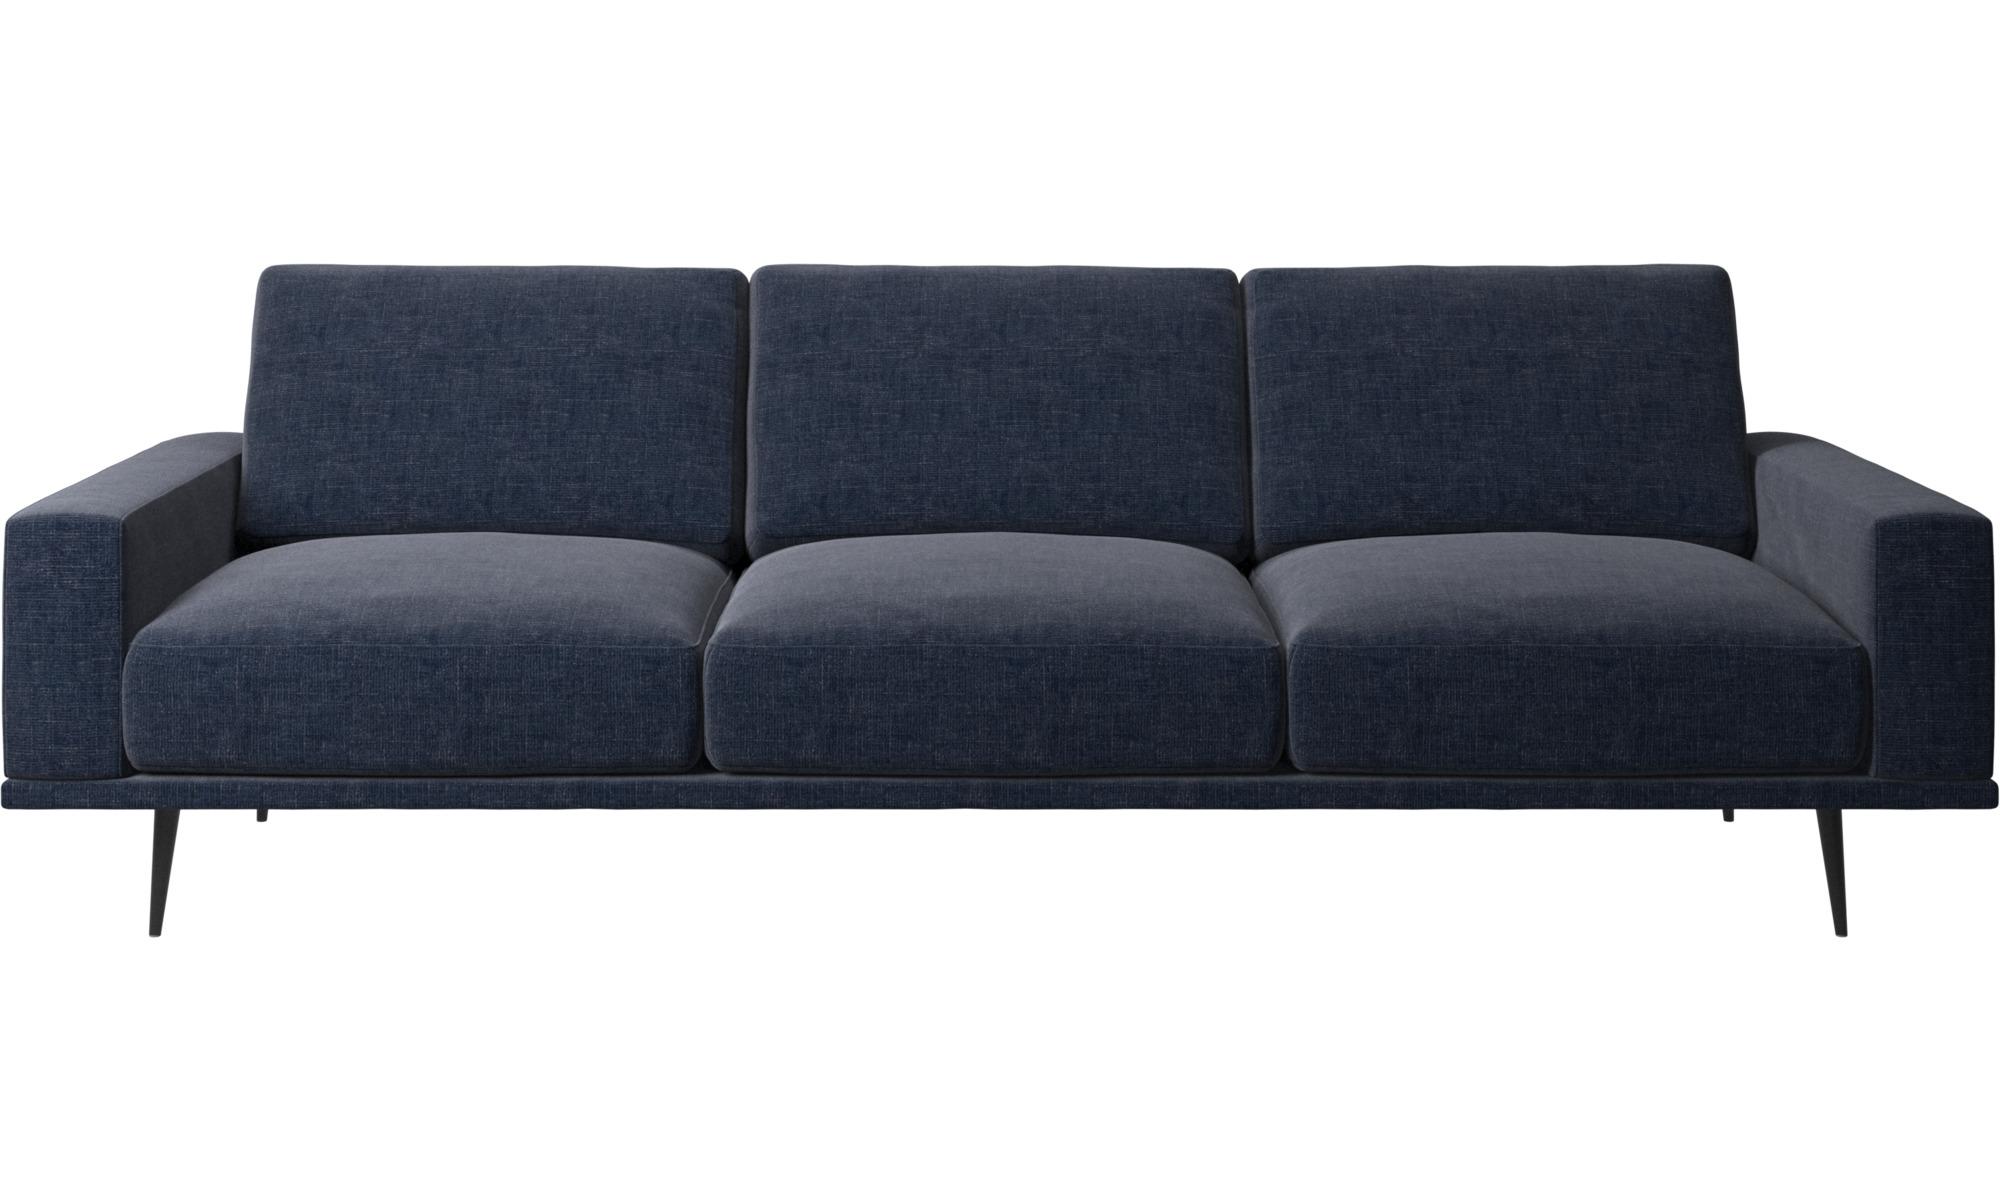 Full Size of 3 Sitzer Sofa Sofas Carlton Boconcept Garnitur Teilig Samt Megapol Led 3er Grau Rahaus Mit Holzfüßen Inhofer Mega Sofa 3 Sitzer Sofa